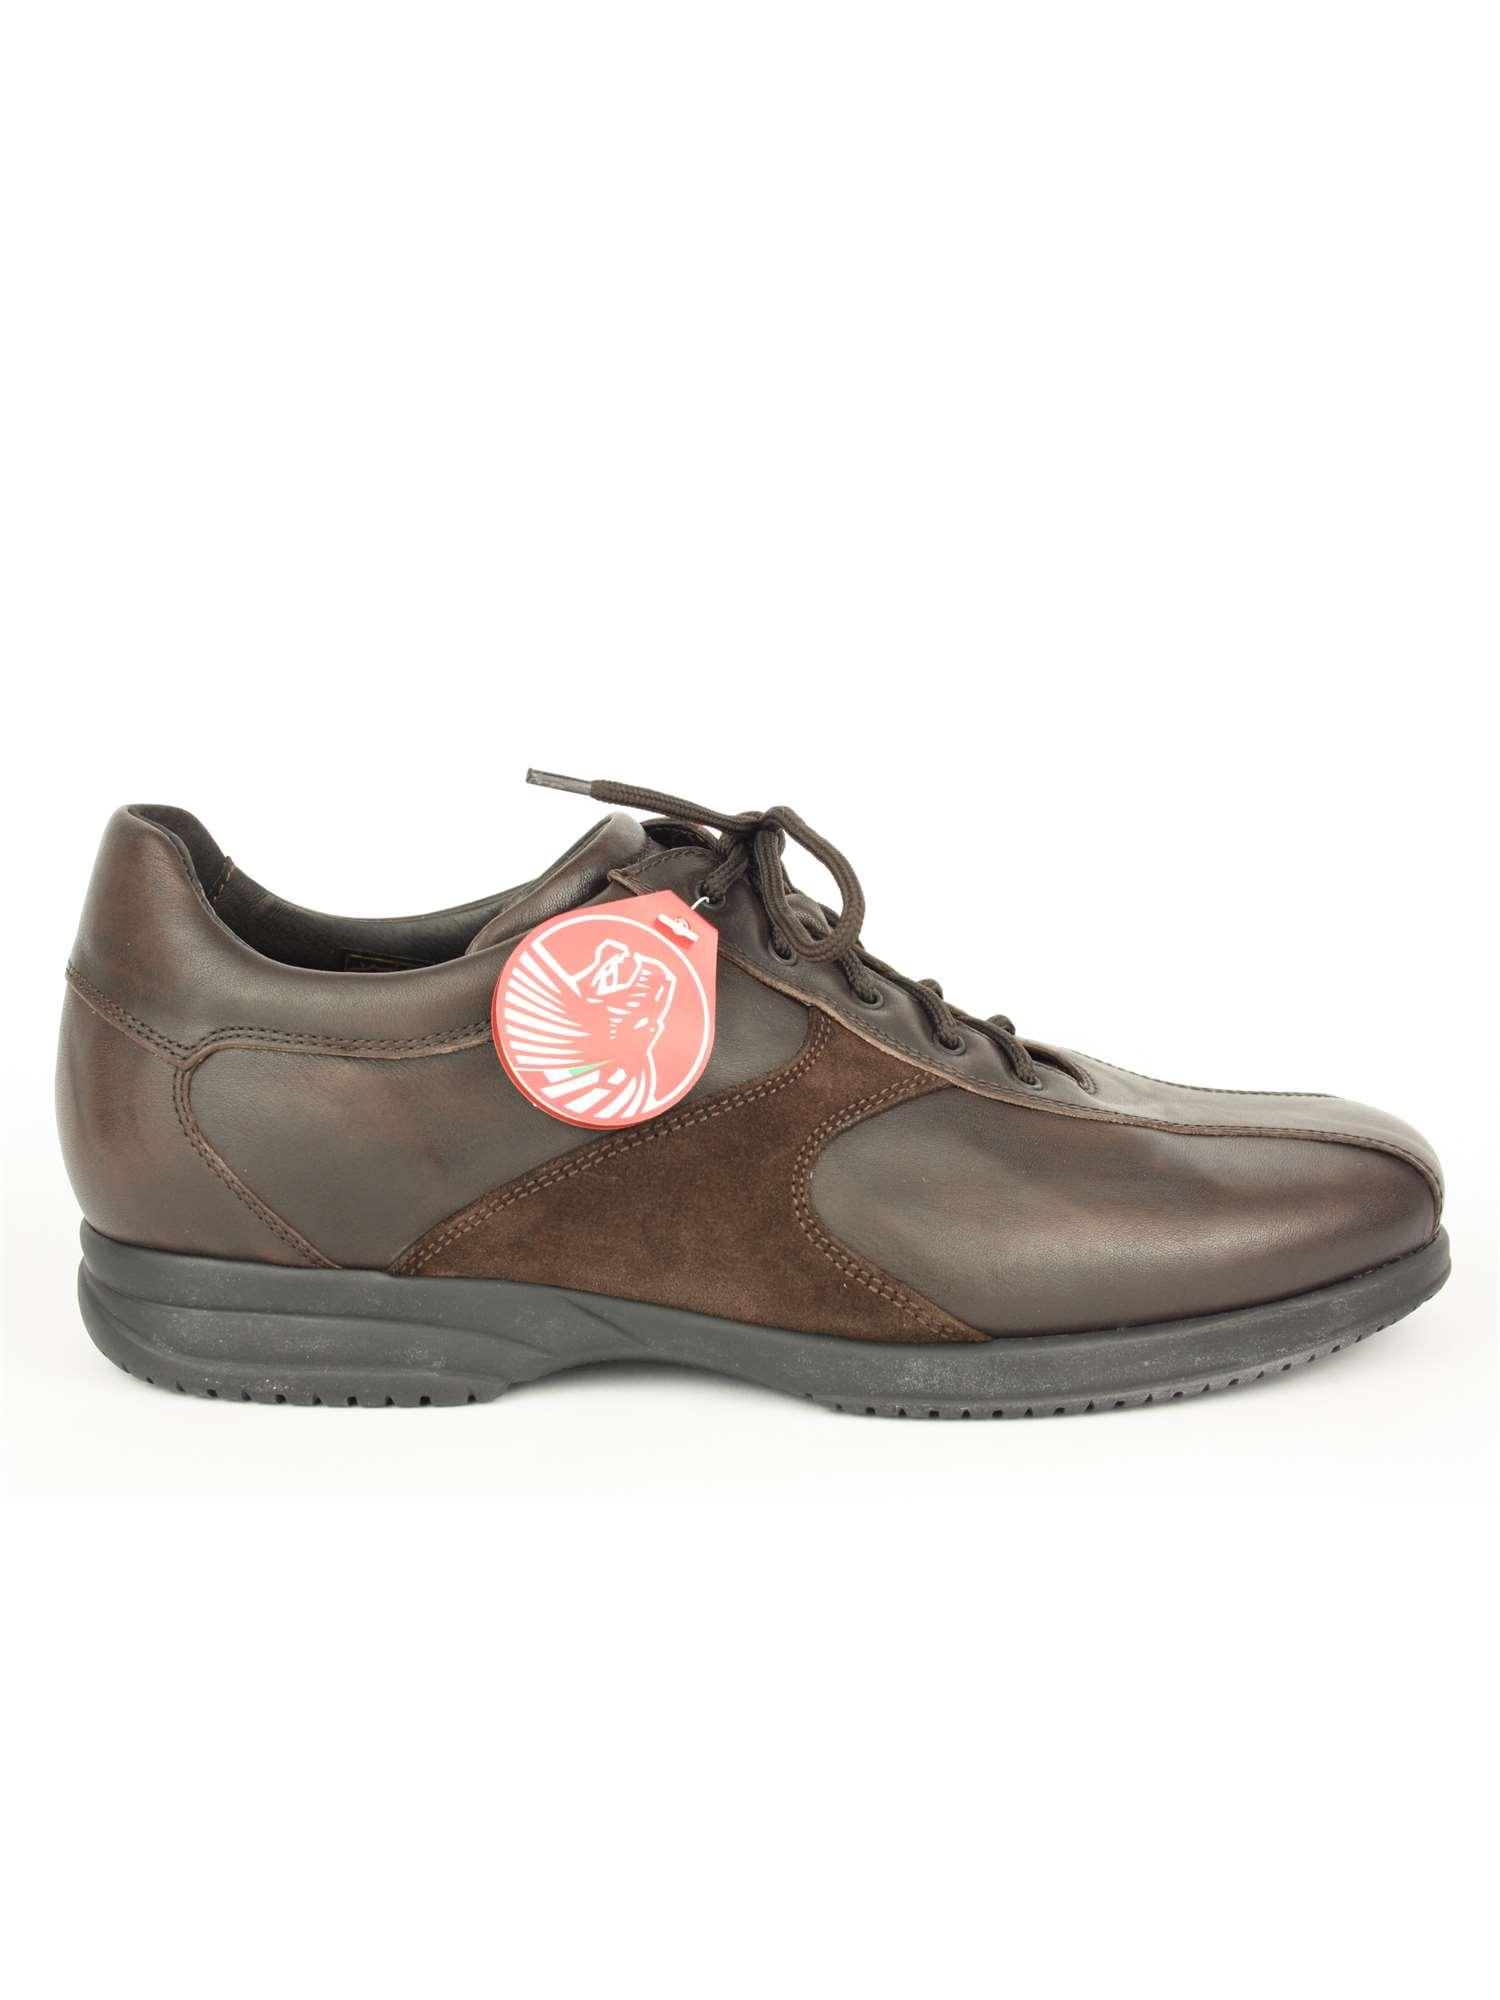 Lion Shoes 10141 Marron Scarpe Uomo c5e8979f1b0